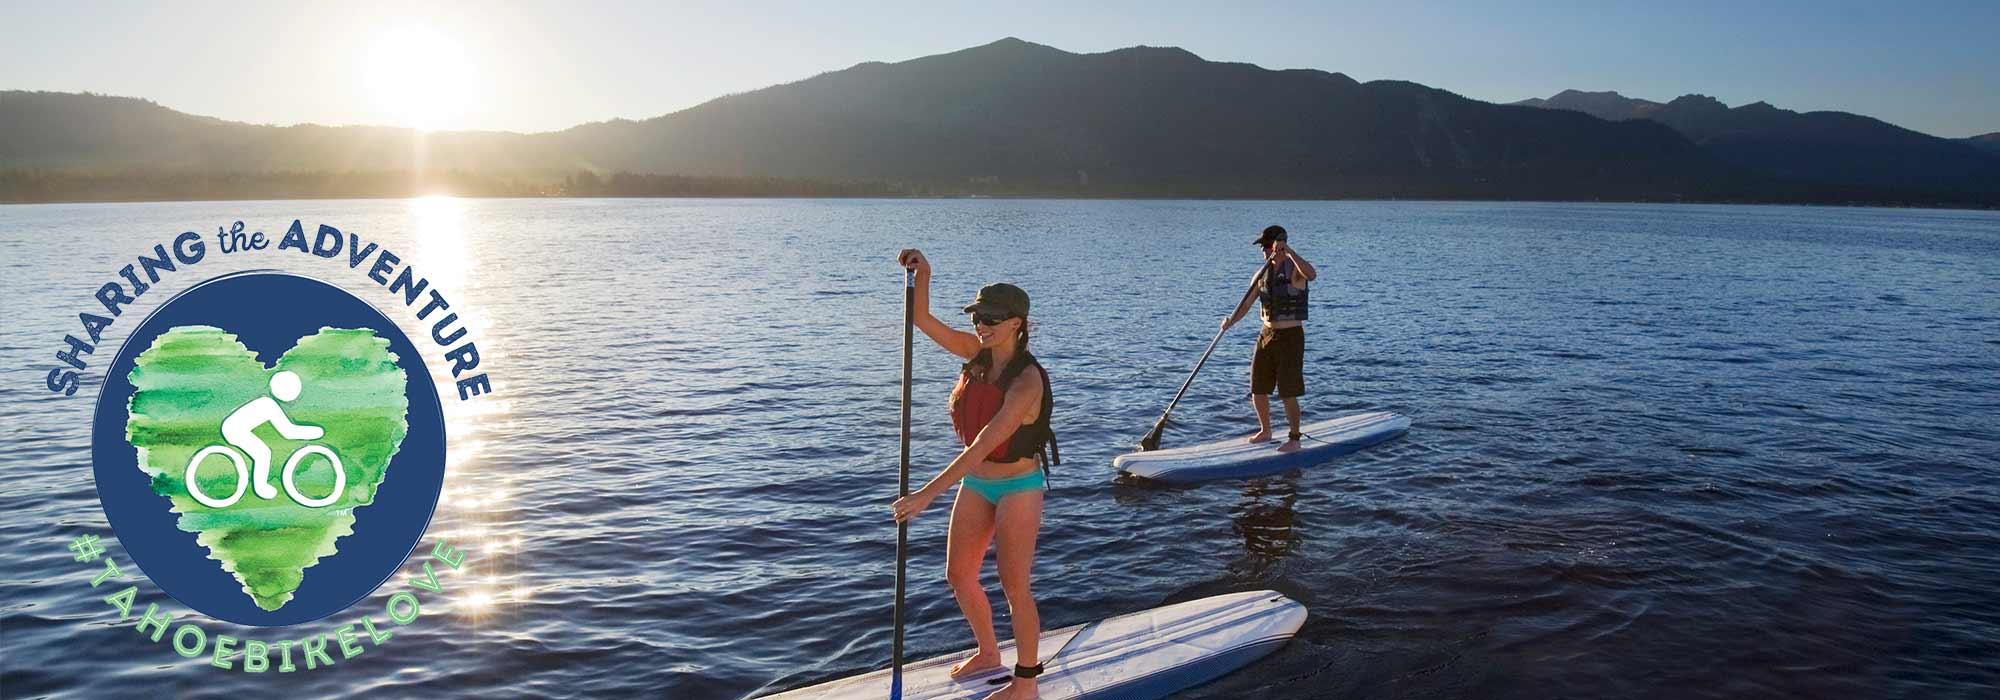 Tahoe Bike Love Activities Paddle Boarding